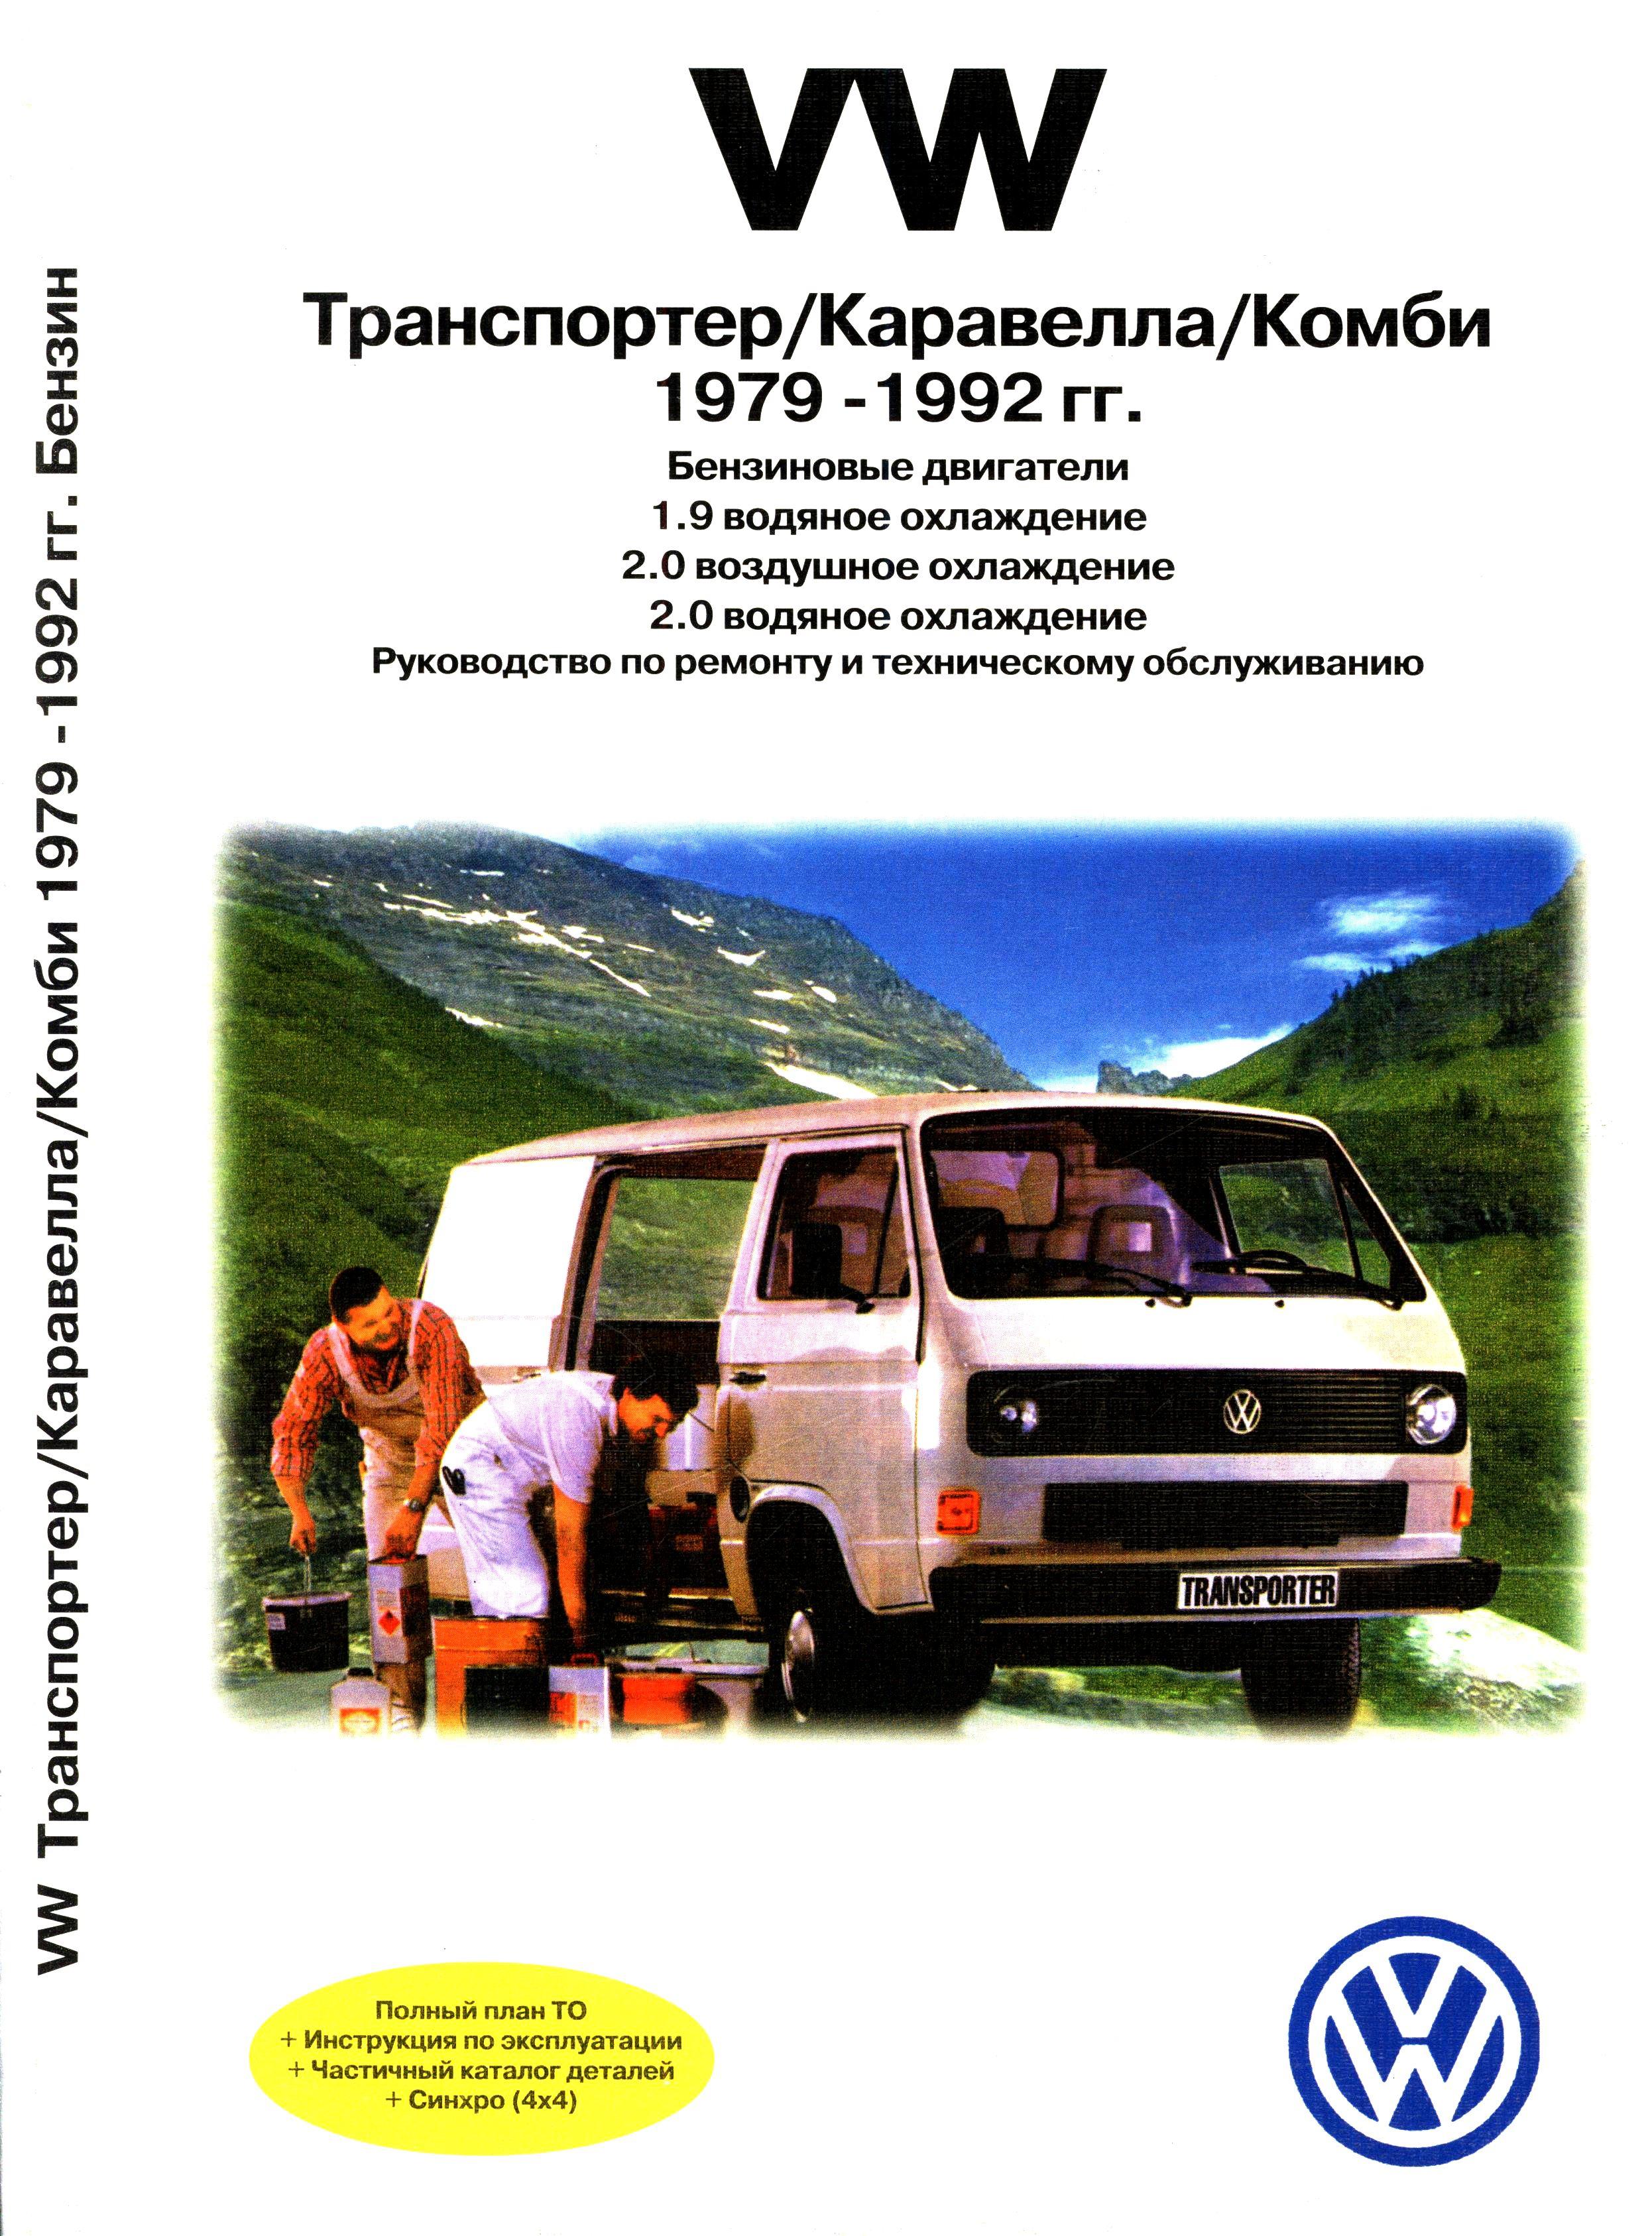 VOLKSWAGEN CARAVELLE / TRANSPORTER / COMBI 1979-1992 бензин Пособие по ремонту и техобслуживанию